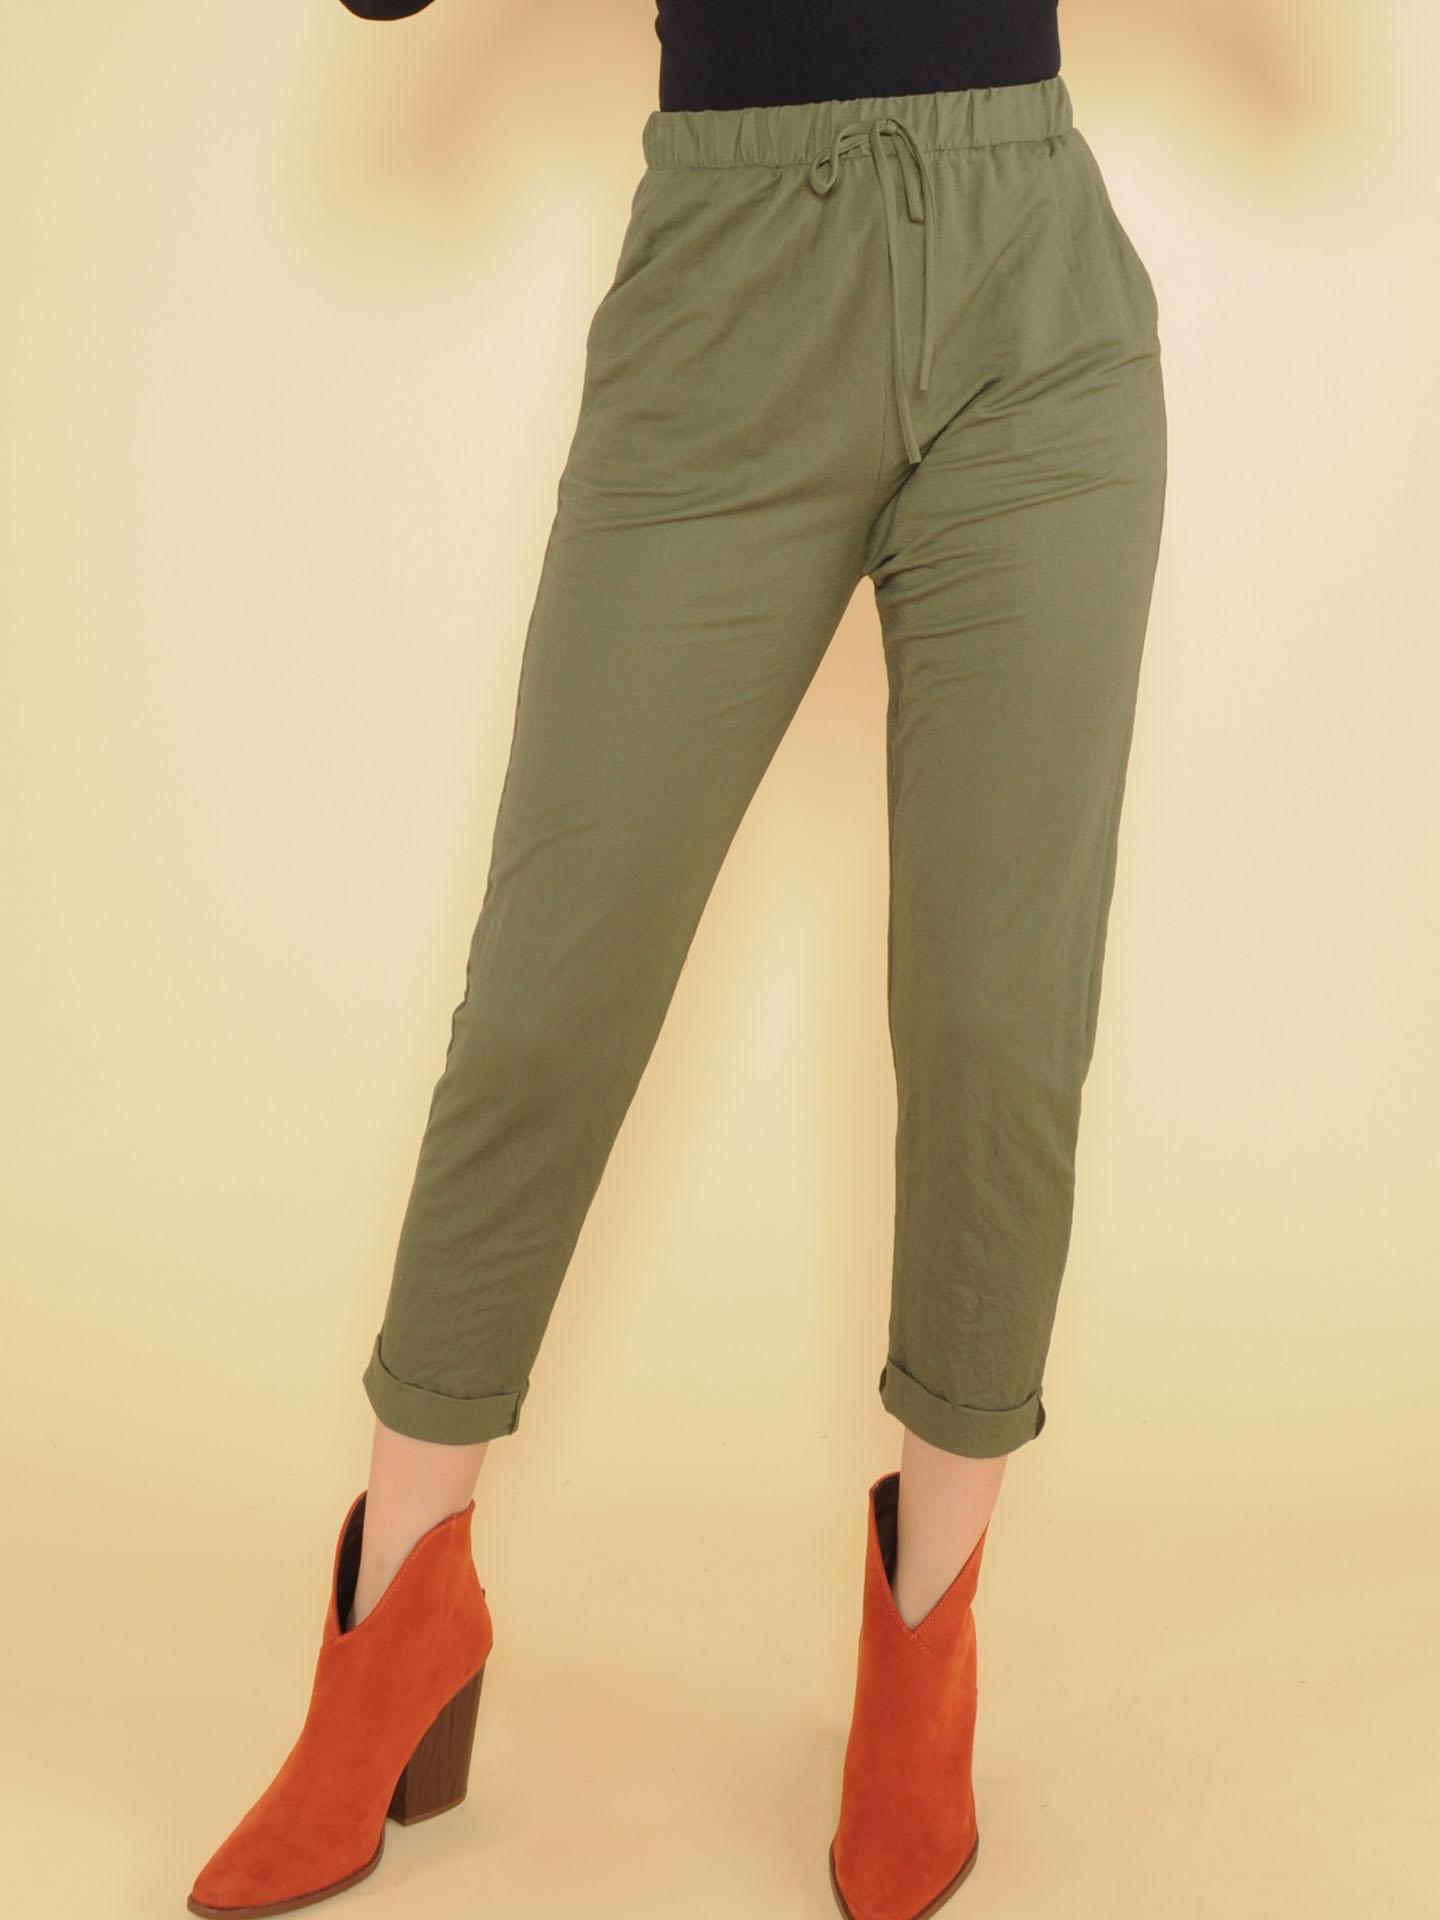 Dexter Pant Comfy Olive Joggers Front